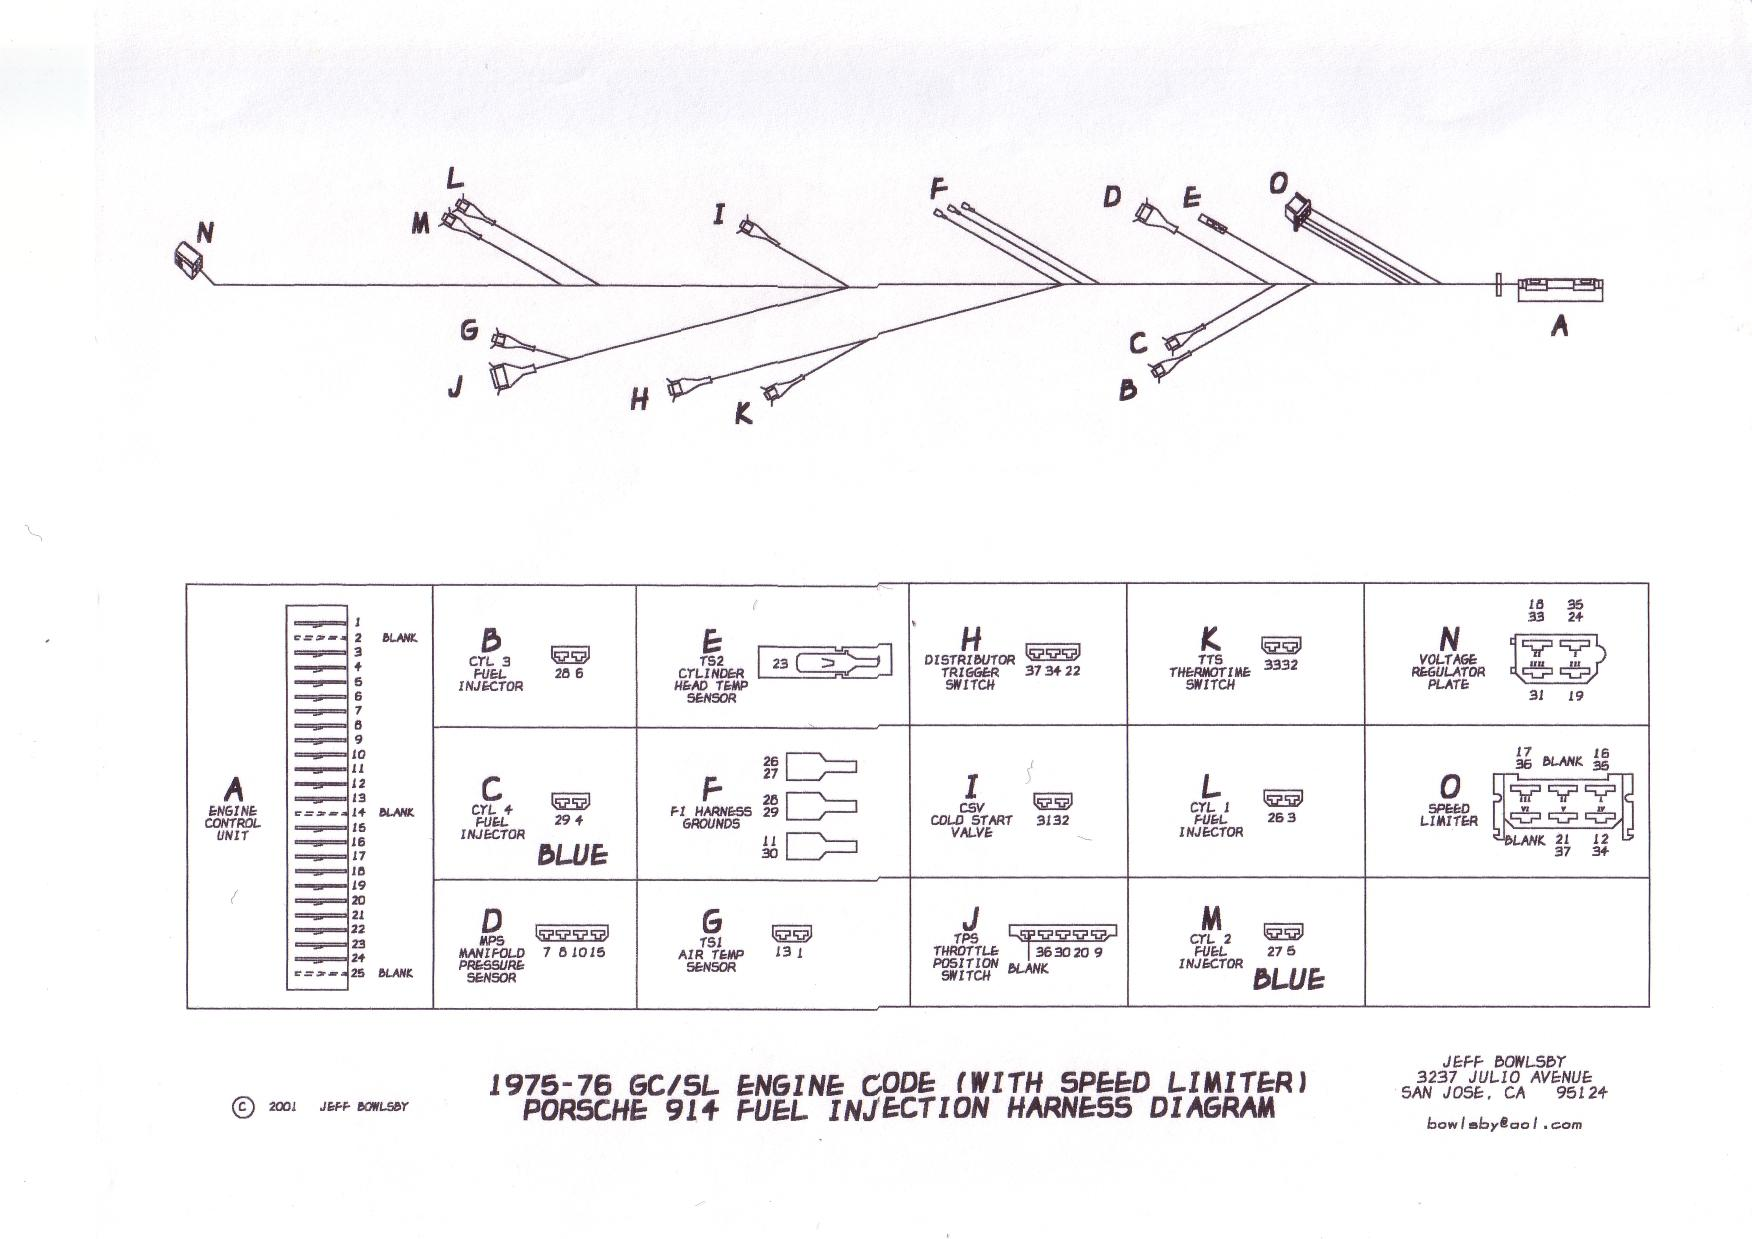 1975 porsche 914 wiring diagram dayton electric motors shoptalkforums